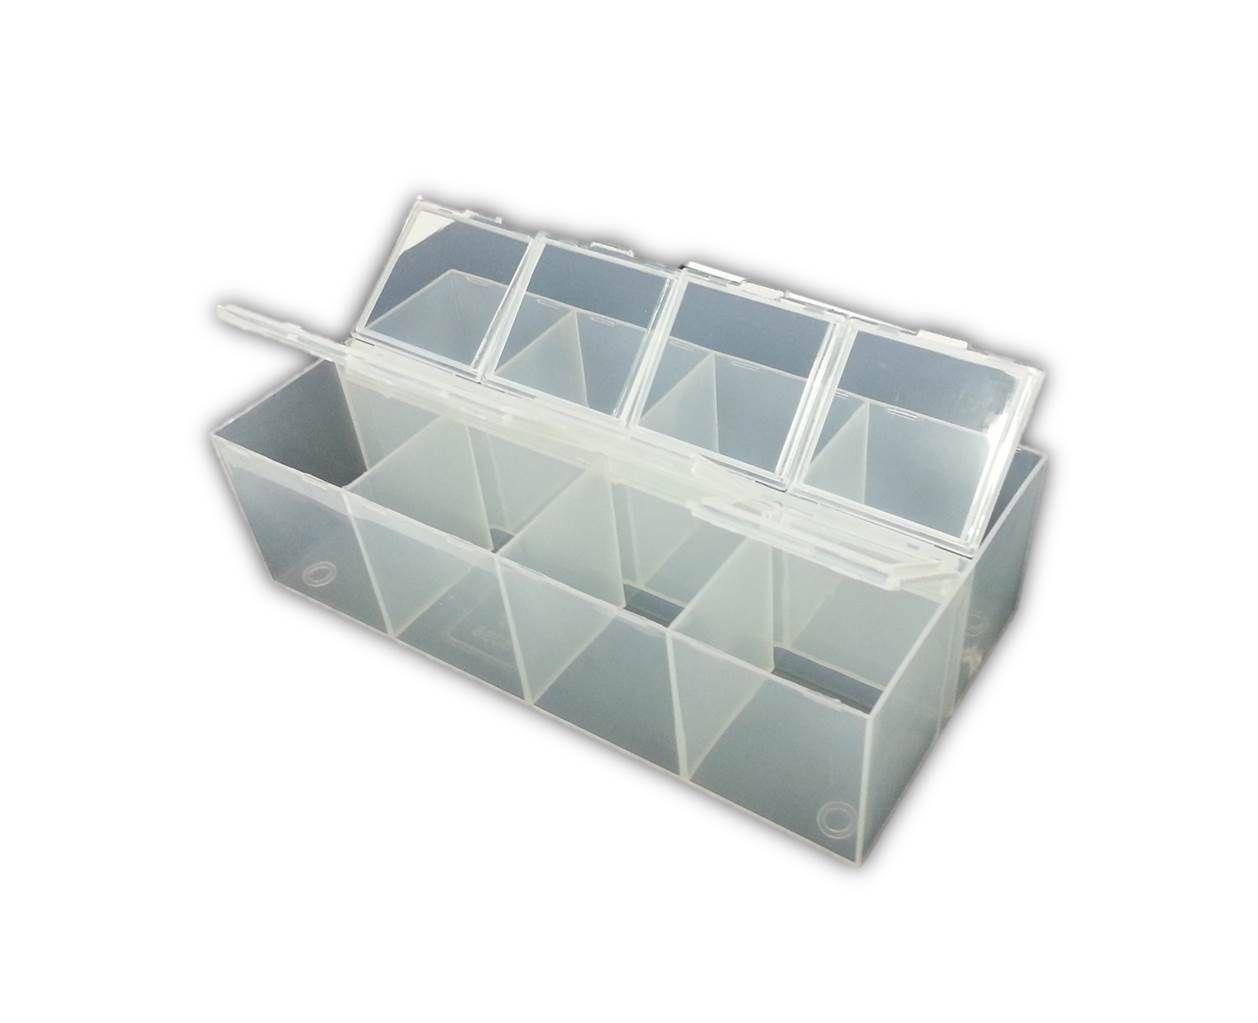 8 compartment plastic bead craft jewellery storage